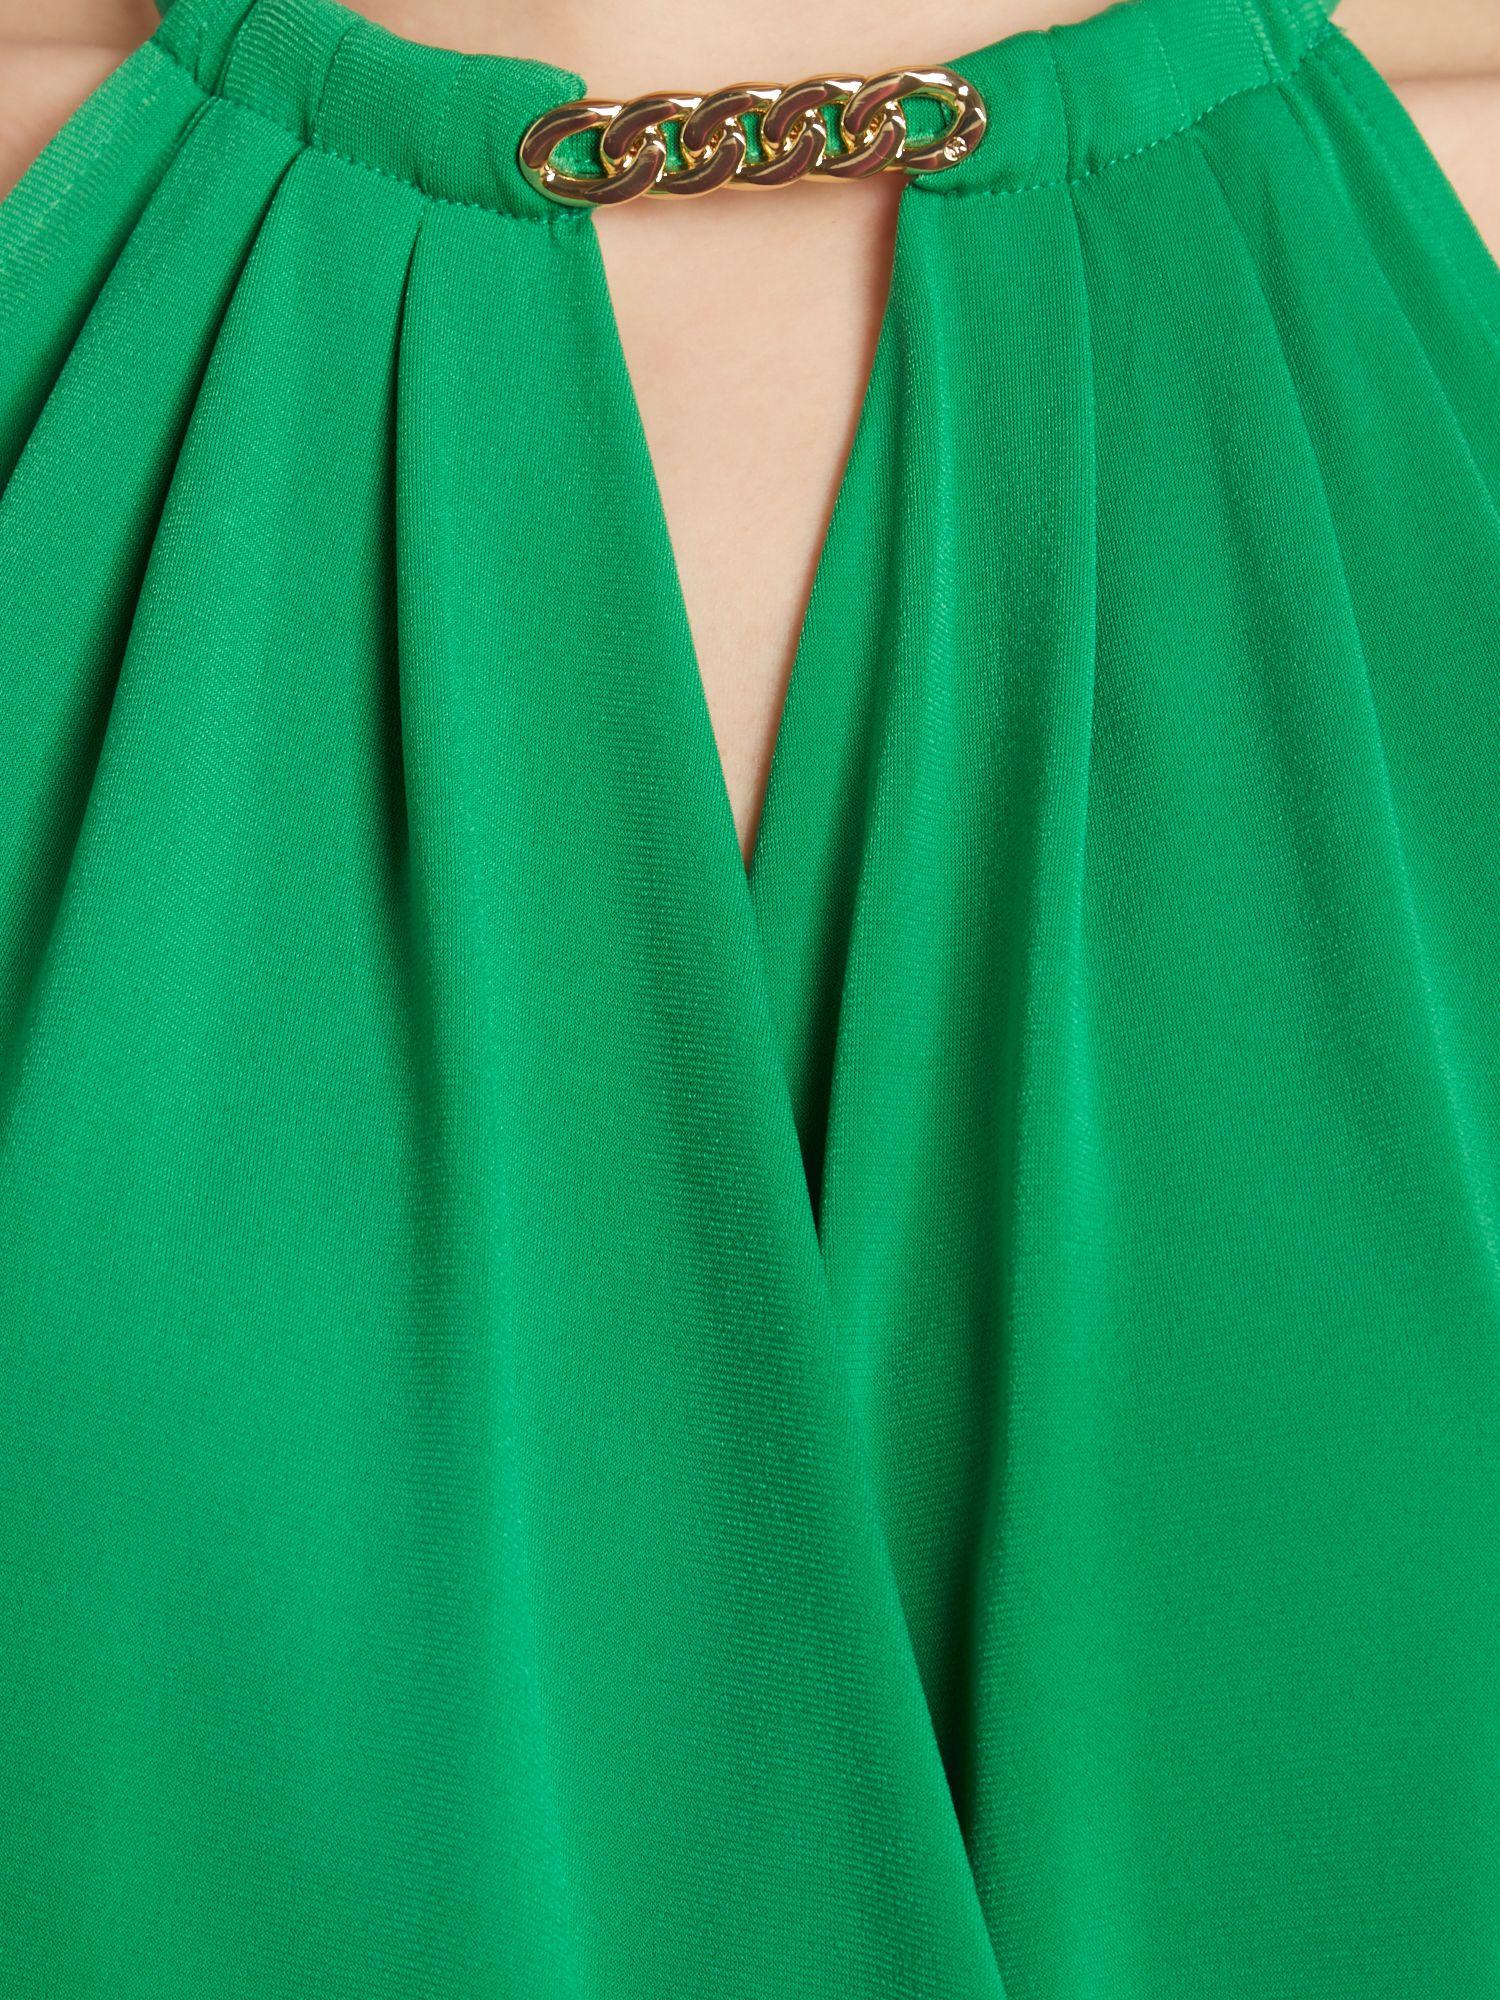 Michael kors halter maxi dress